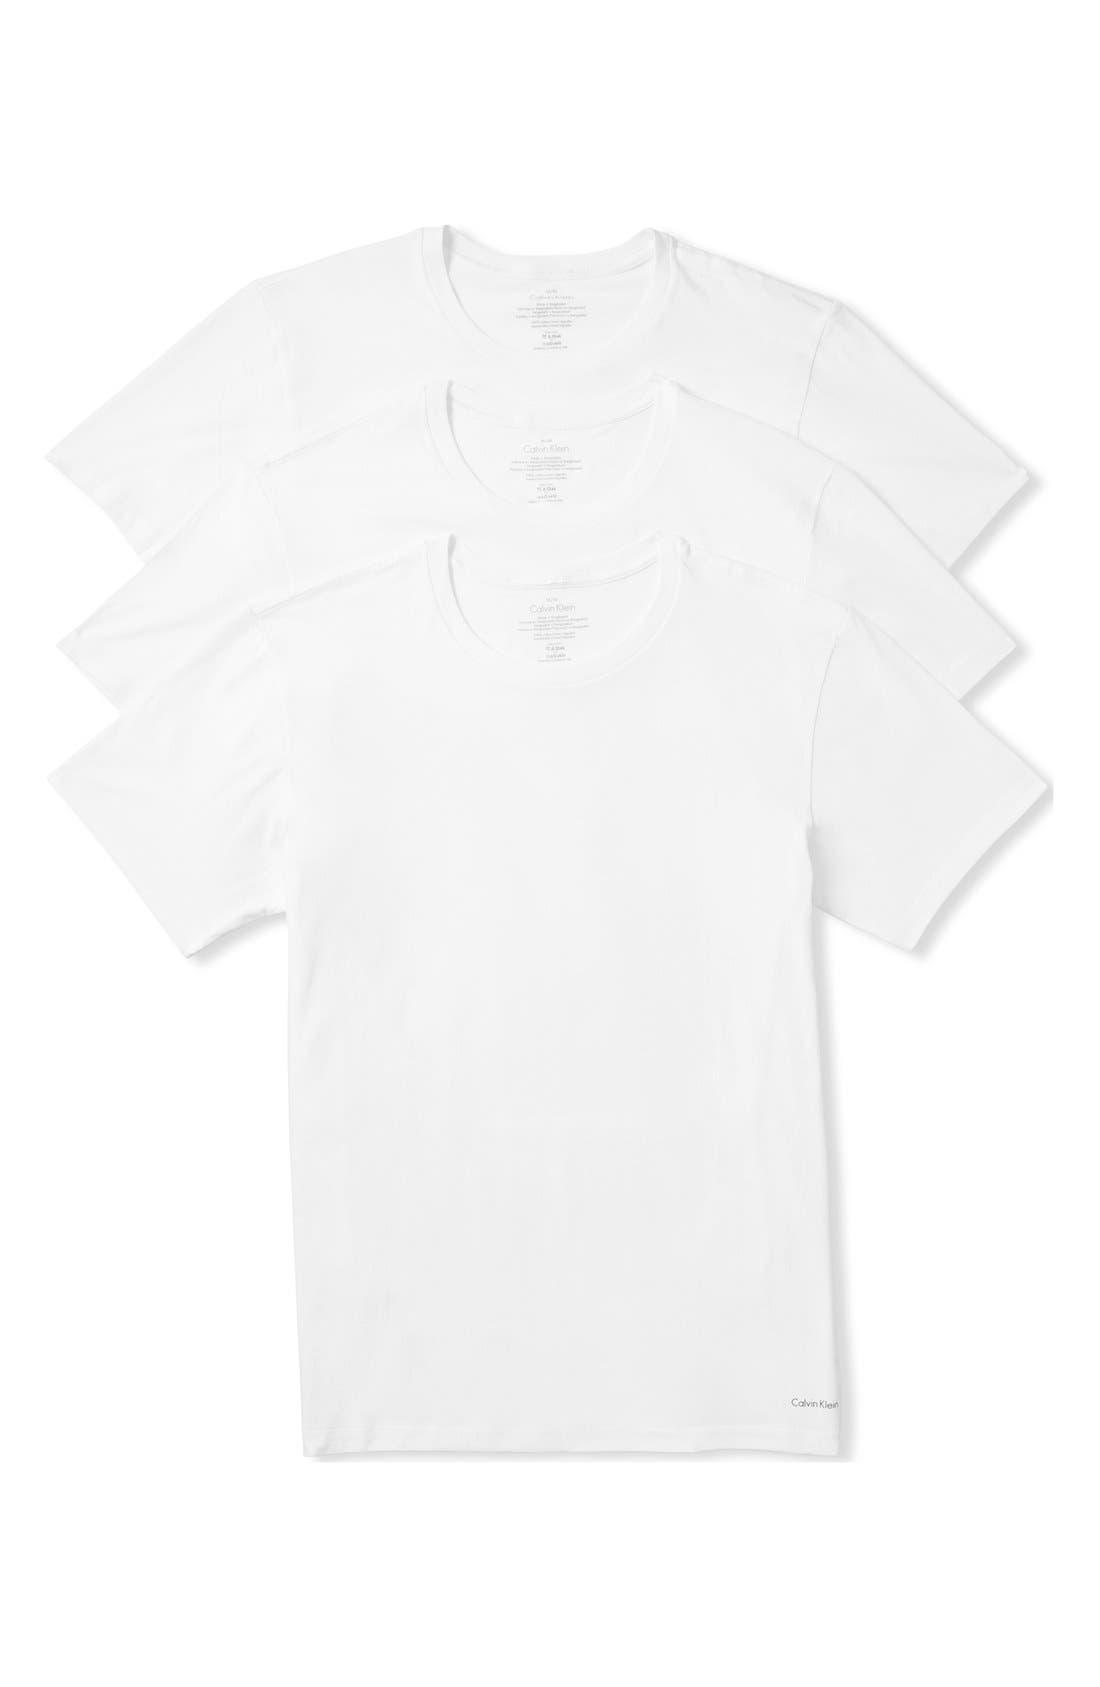 CALVIN KLEIN, 3-Pack Cotton T-Shirt, Main thumbnail 1, color, WHITE